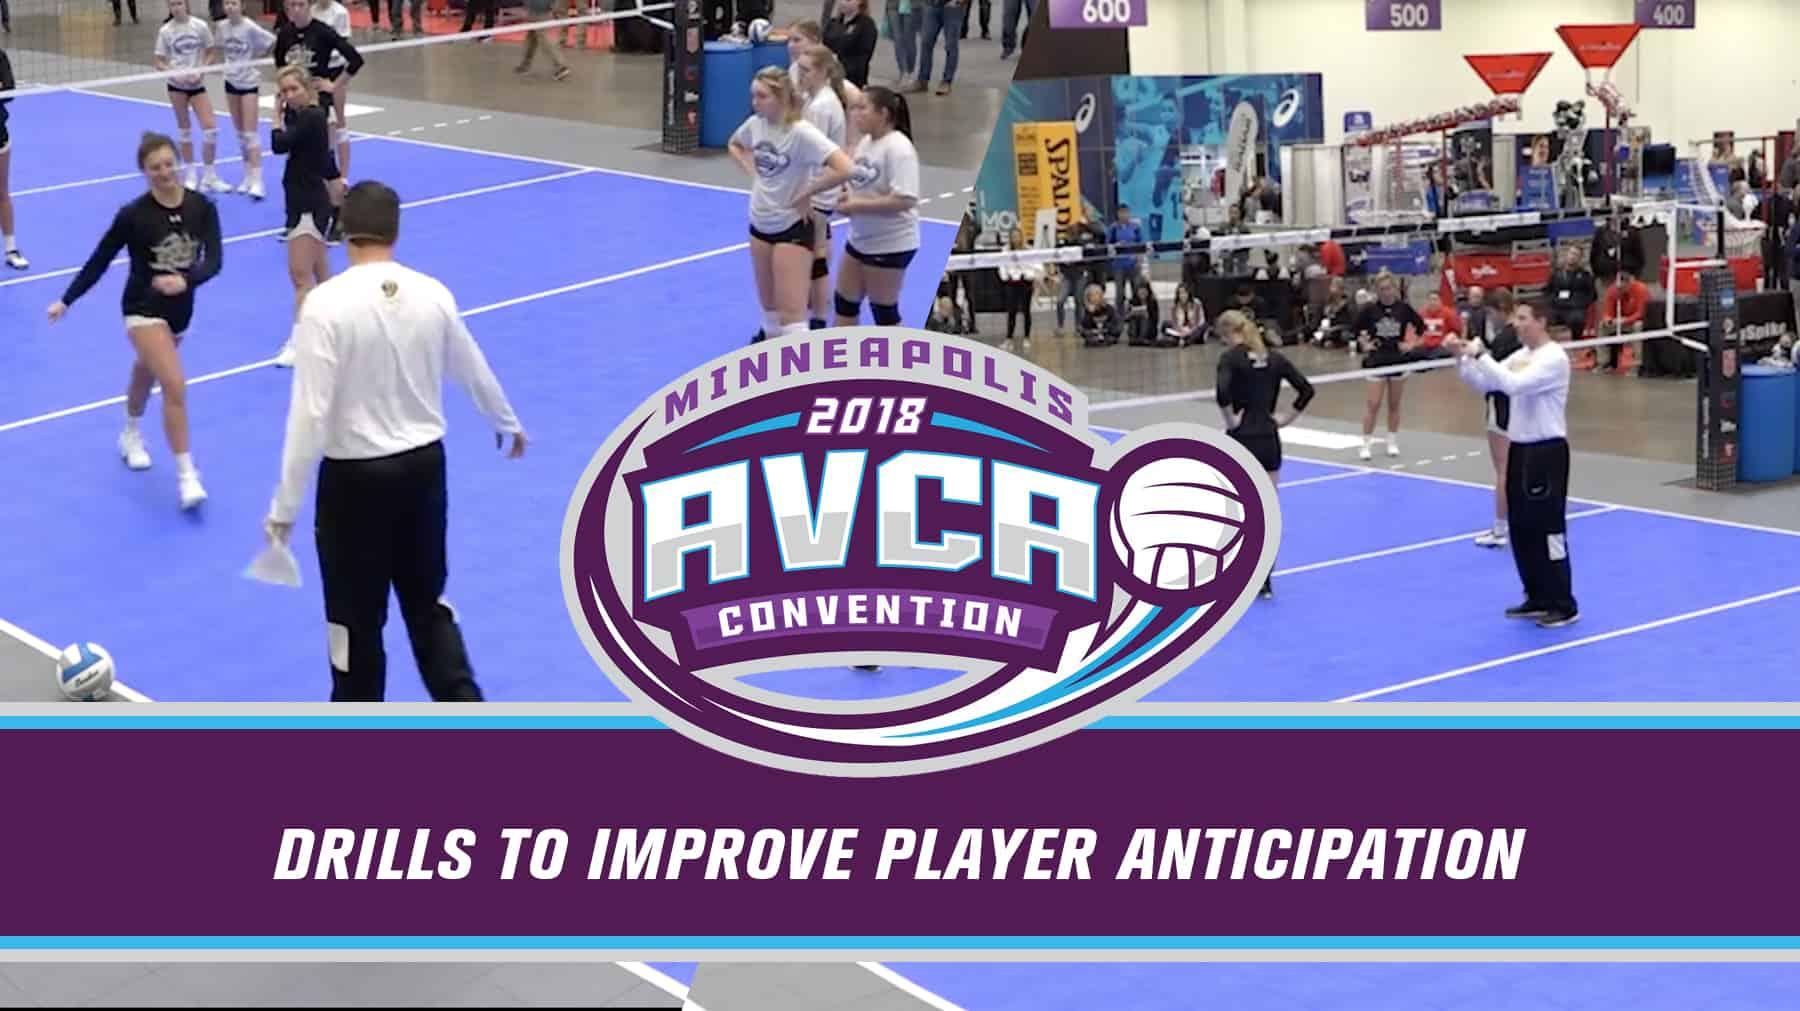 Indoor Drills To Improve Player Anticipation